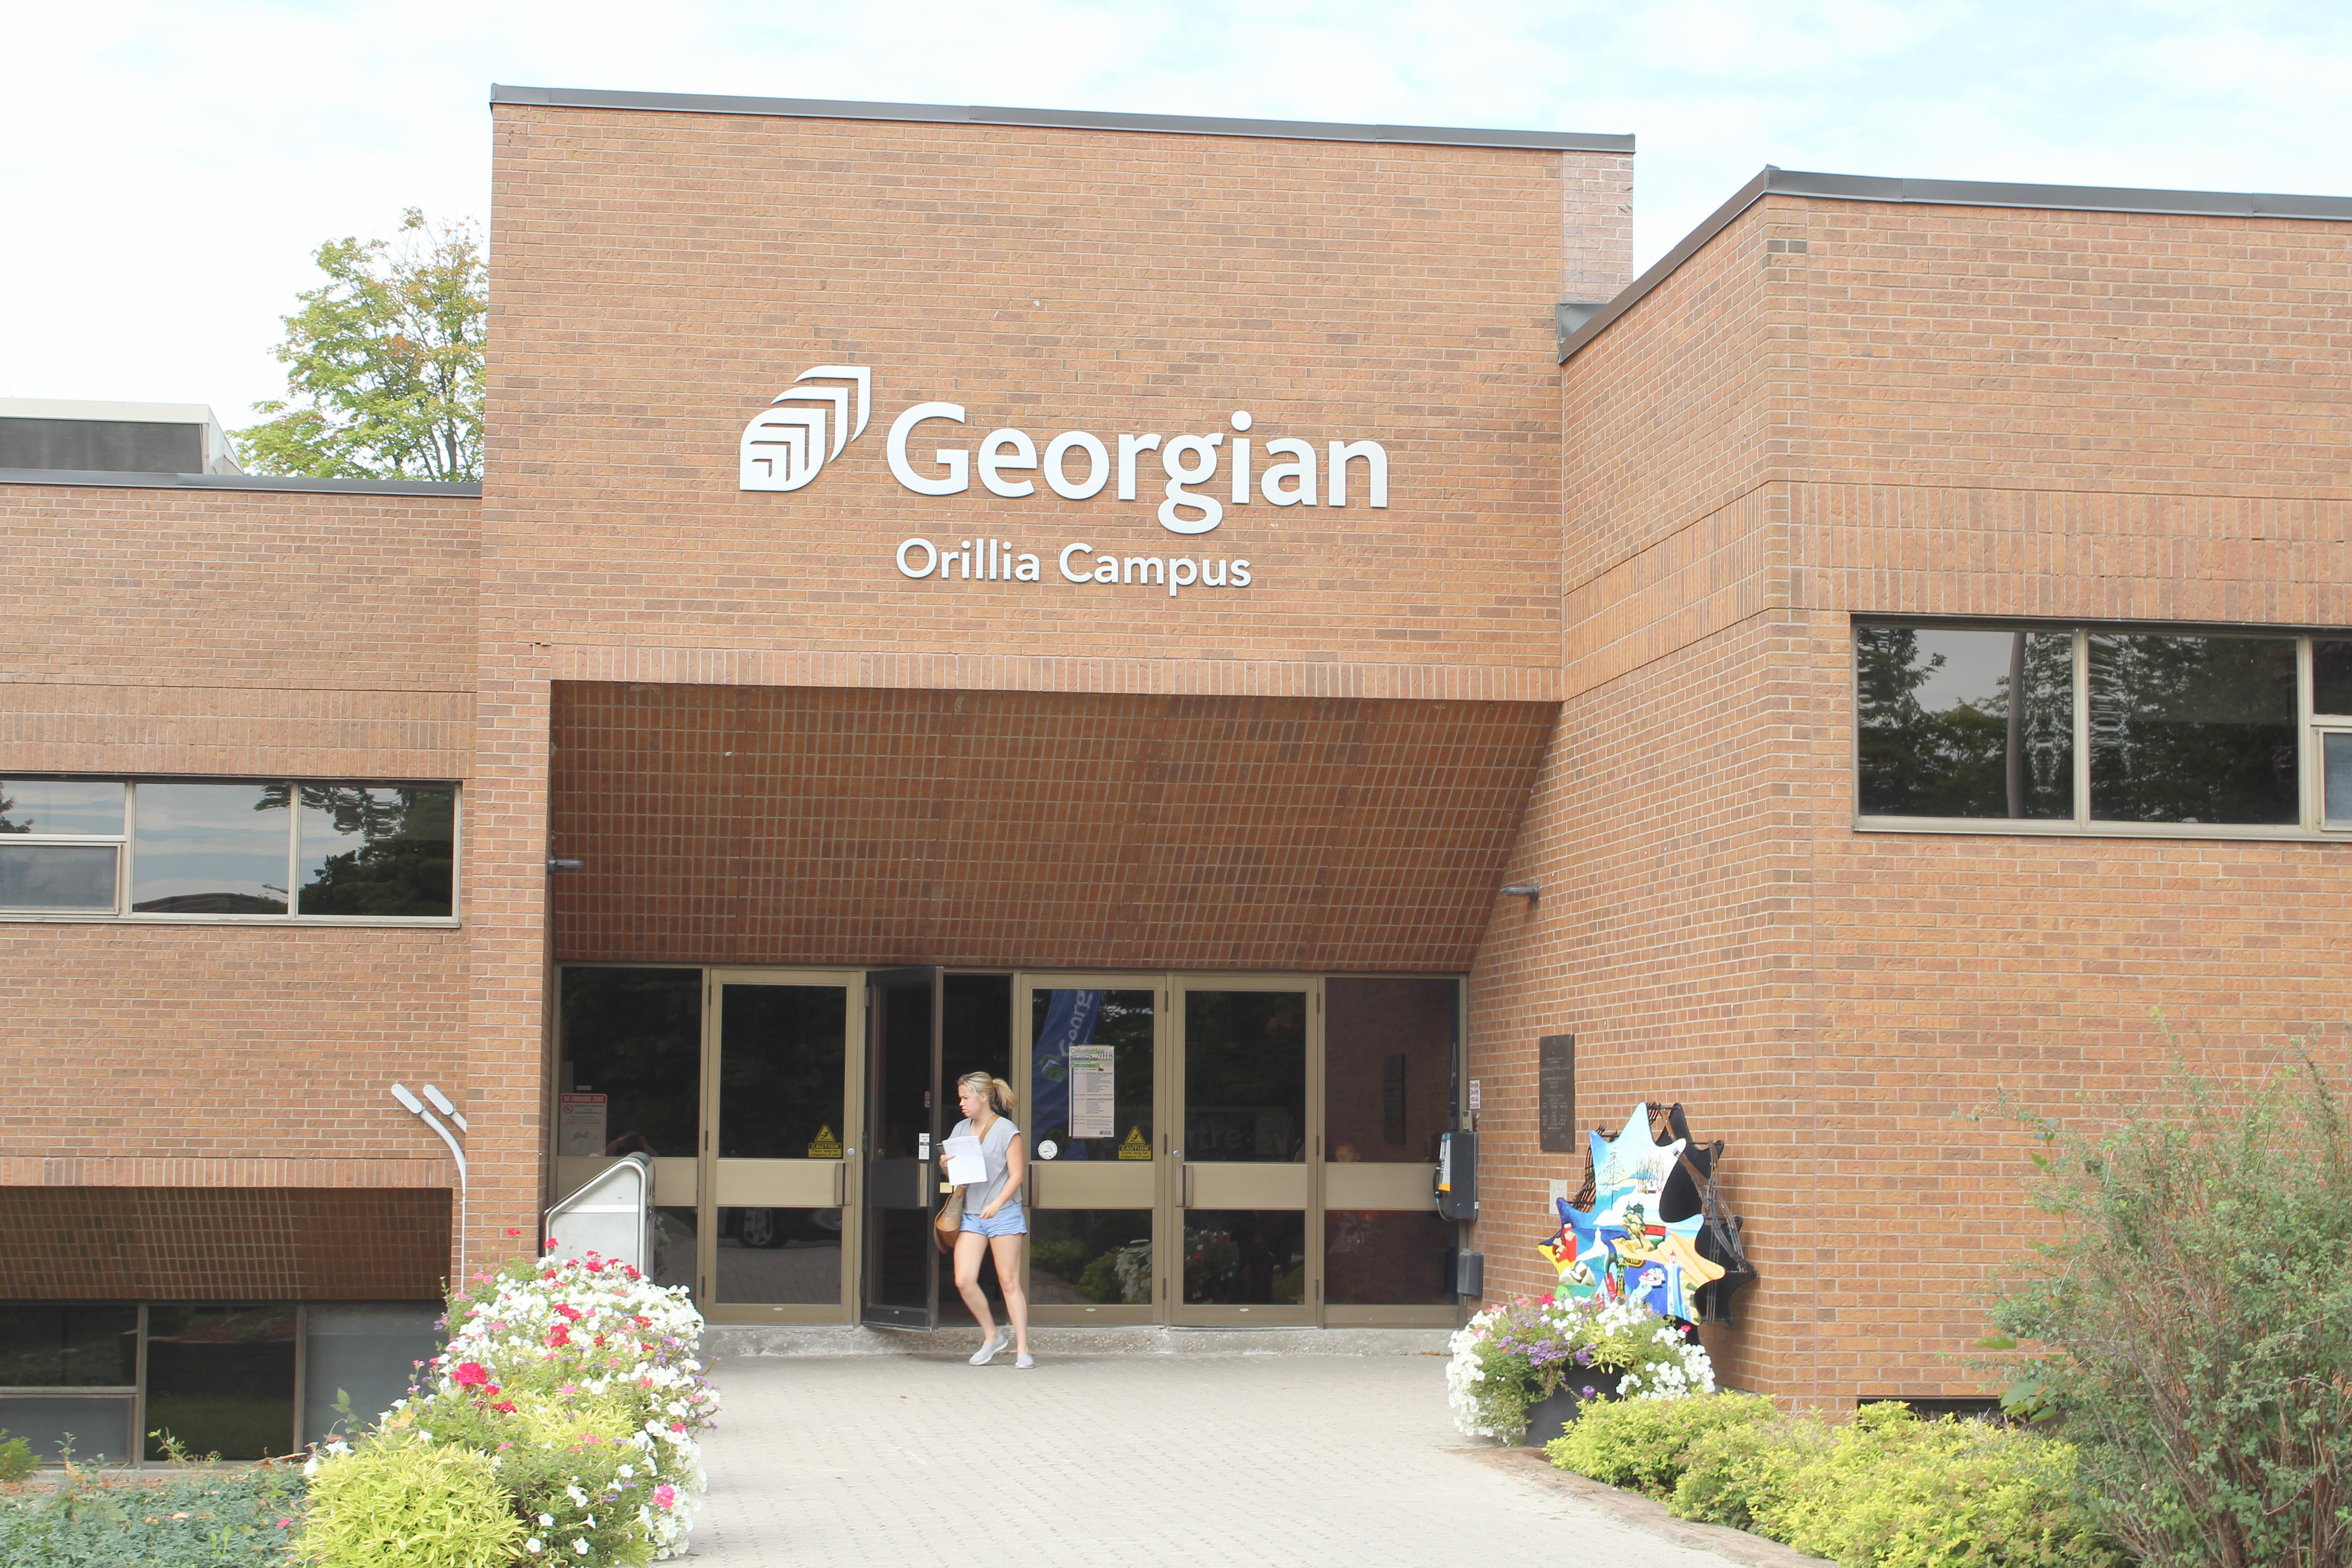 Georgian College Announces New 1m Covid 19 Hardship Bursary Orilliamatters Com